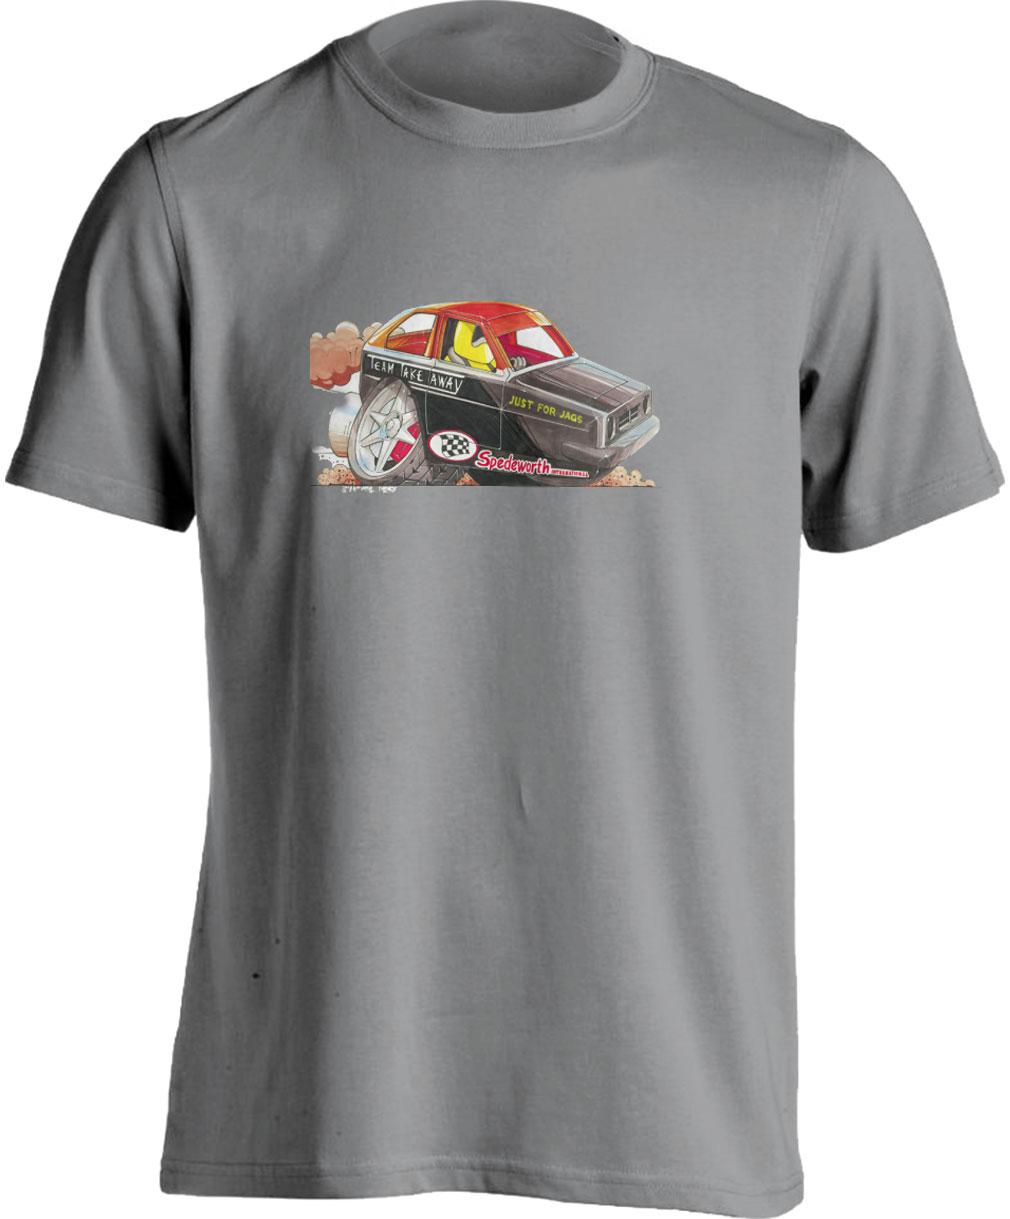 Koolart Robin Stock Car 1305 T Shirt